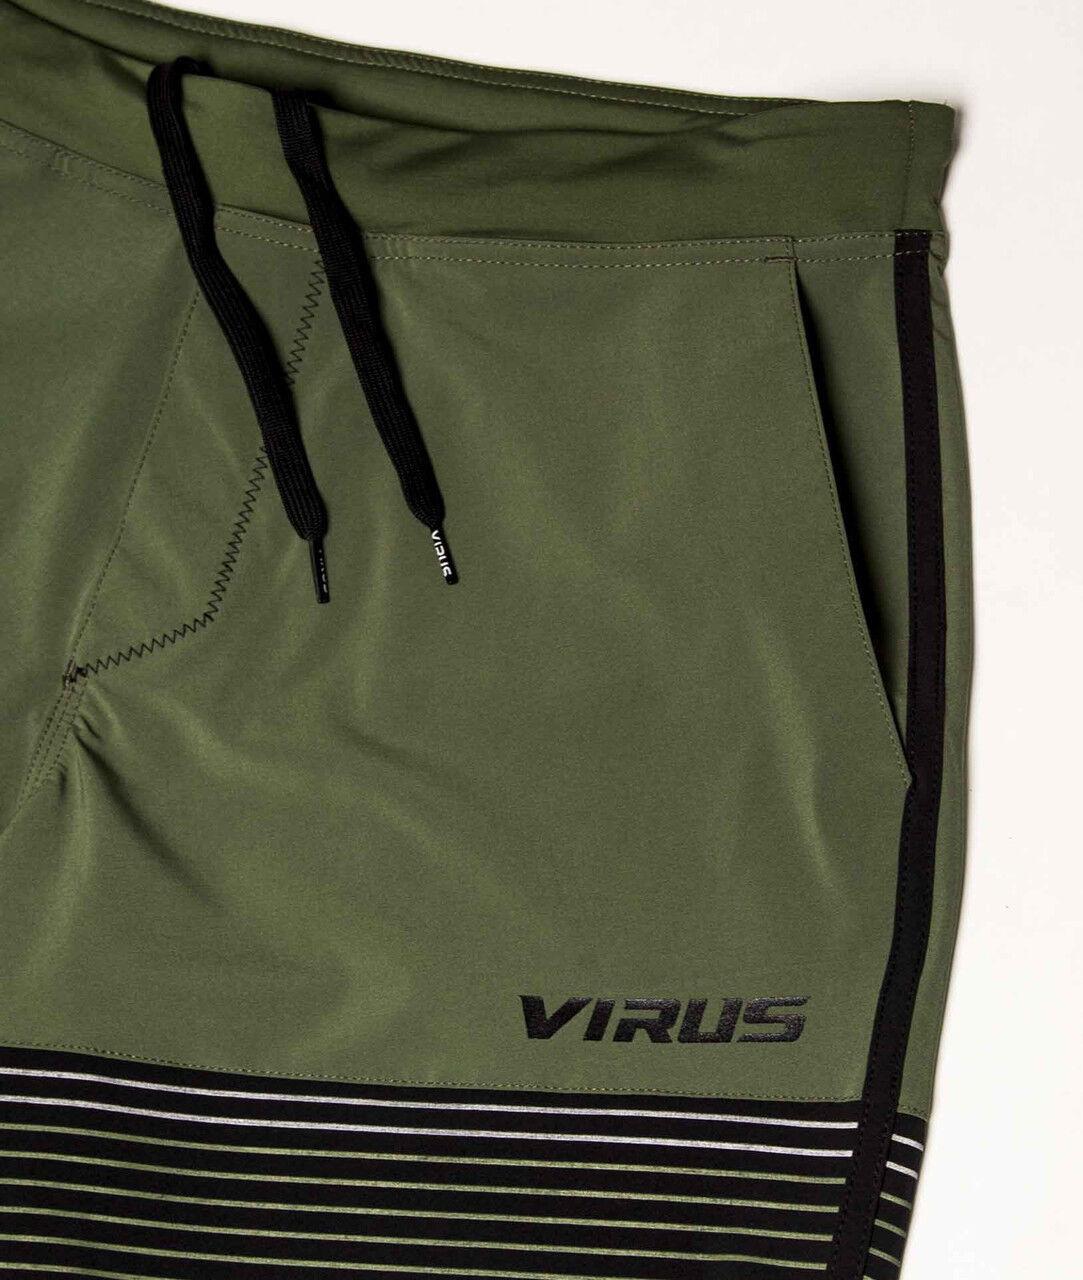 VIRUS (ST5) Herren VELOCITY SHORT (ST5) VIRUS OLIVE Grün CrossFit WeightLifting 02aceb